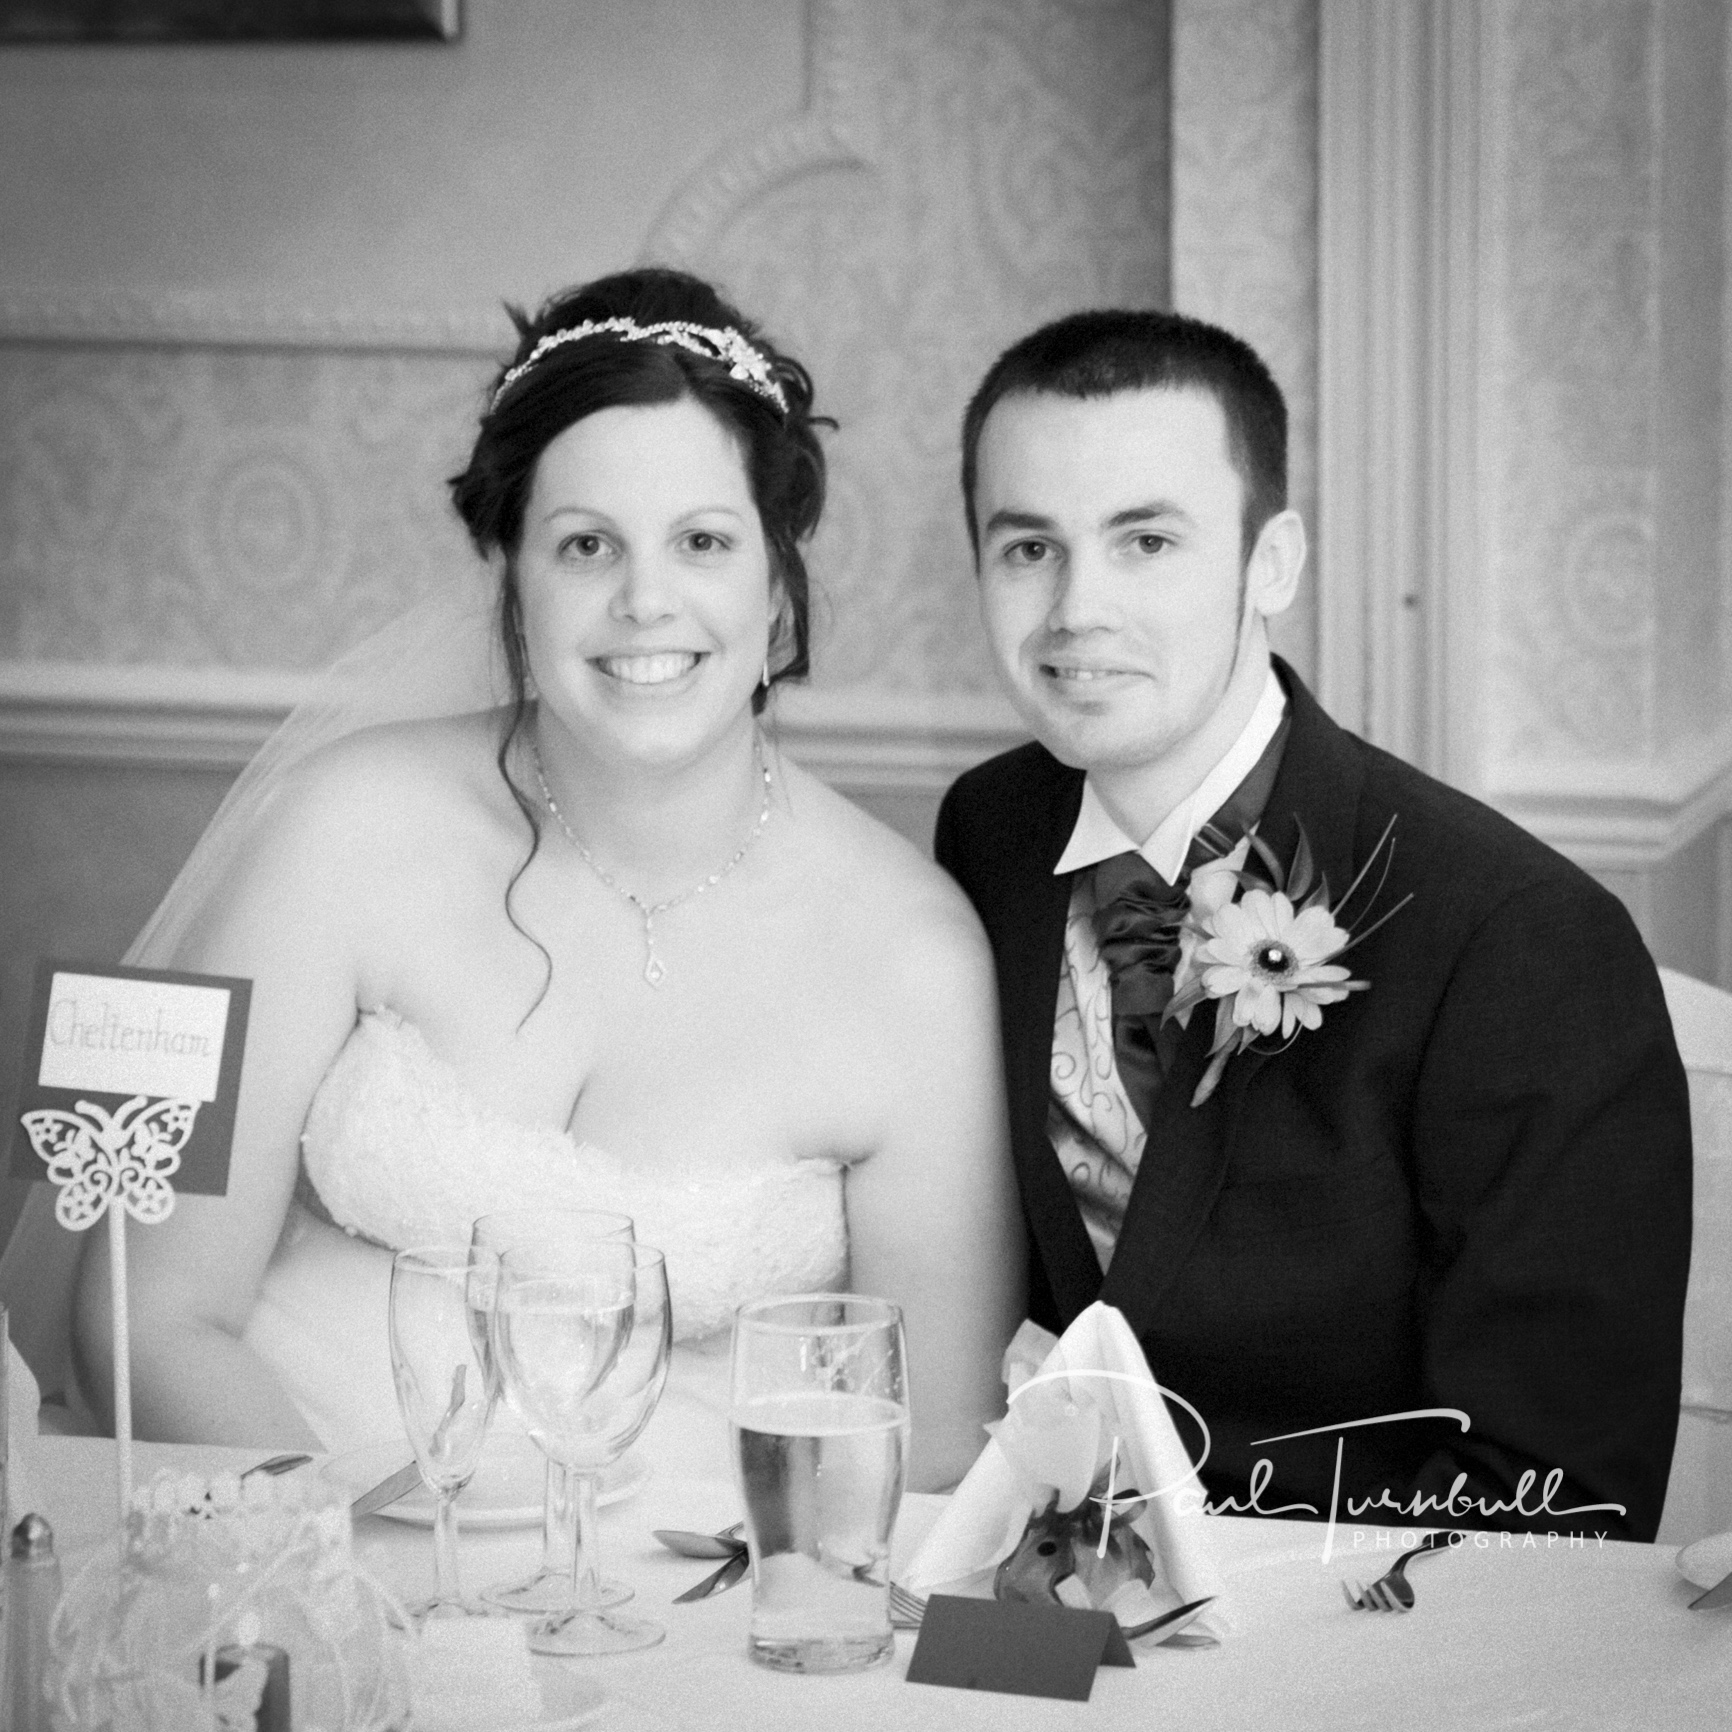 wedding-photography-wood-hall-wetherby-yorkshire-056.jpg